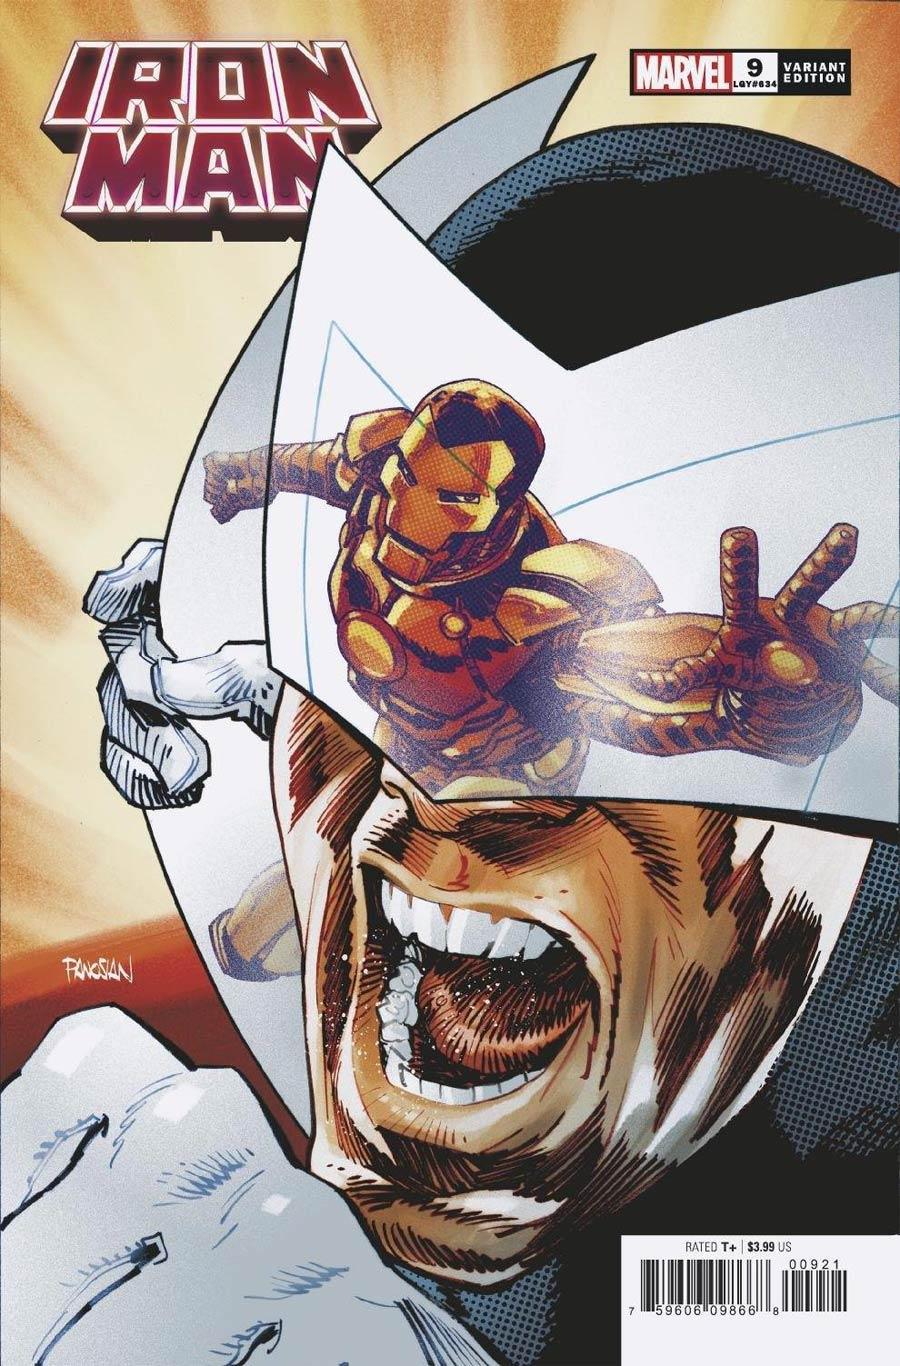 Iron Man Vol 6 #9 Cover B Variant Dan Panosian Spider-Man Villains Cover